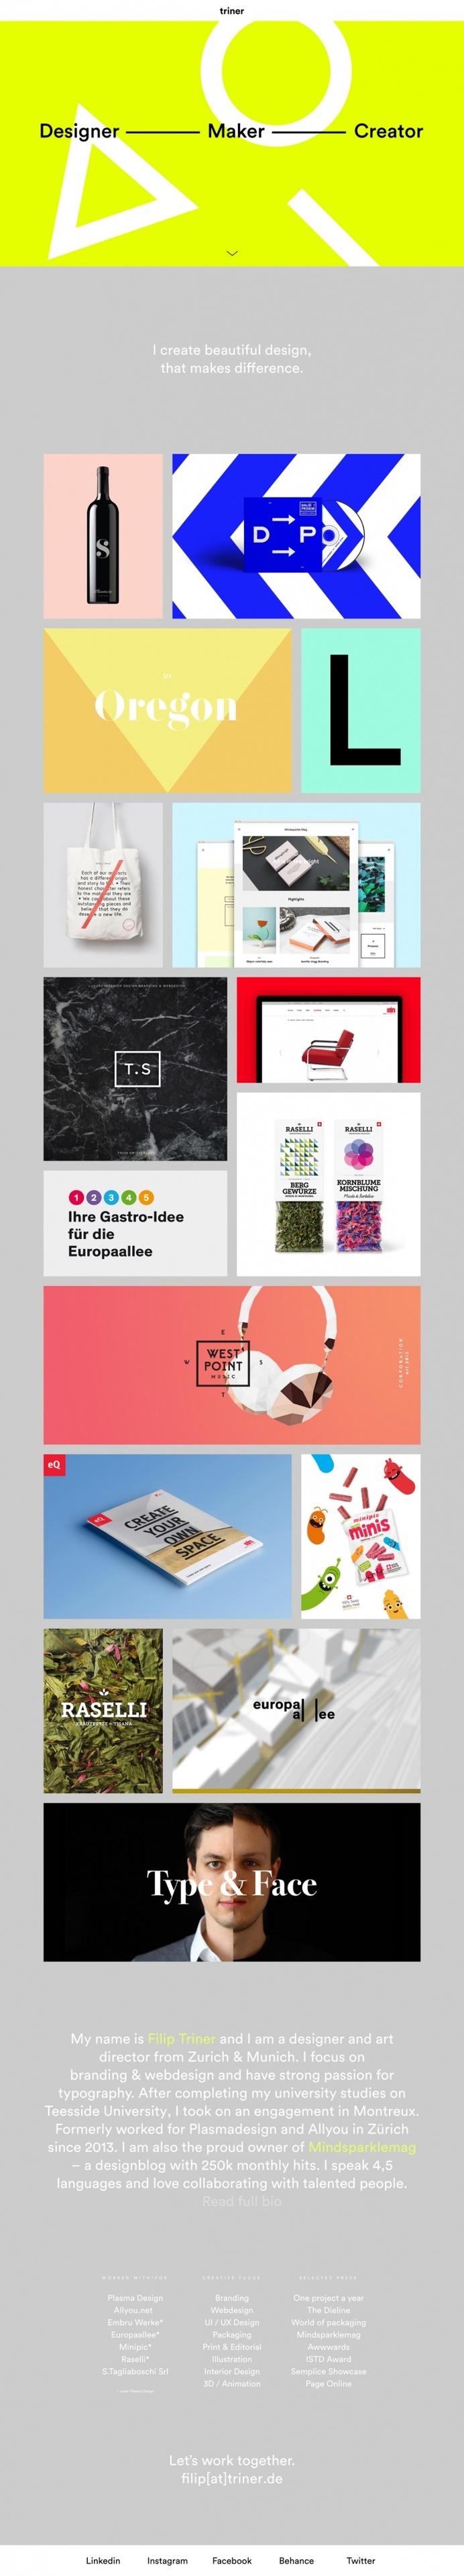 Designer In München filip triner designer maker münchen zürich germany webdesign website